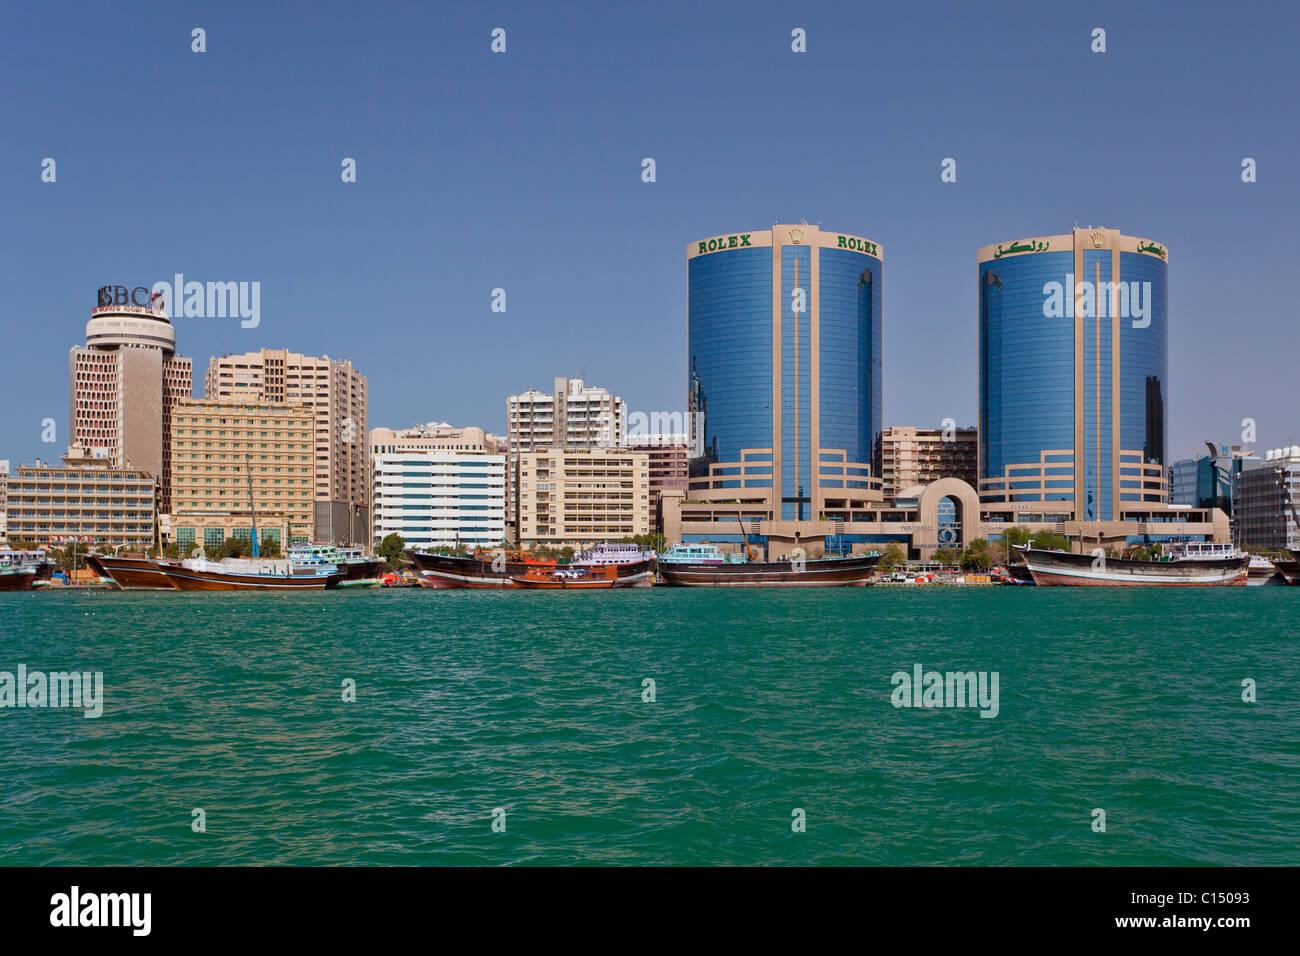 The Dubai Creek skyline office towers in Dubai, UAE, Persian Gulf. - Stock Image